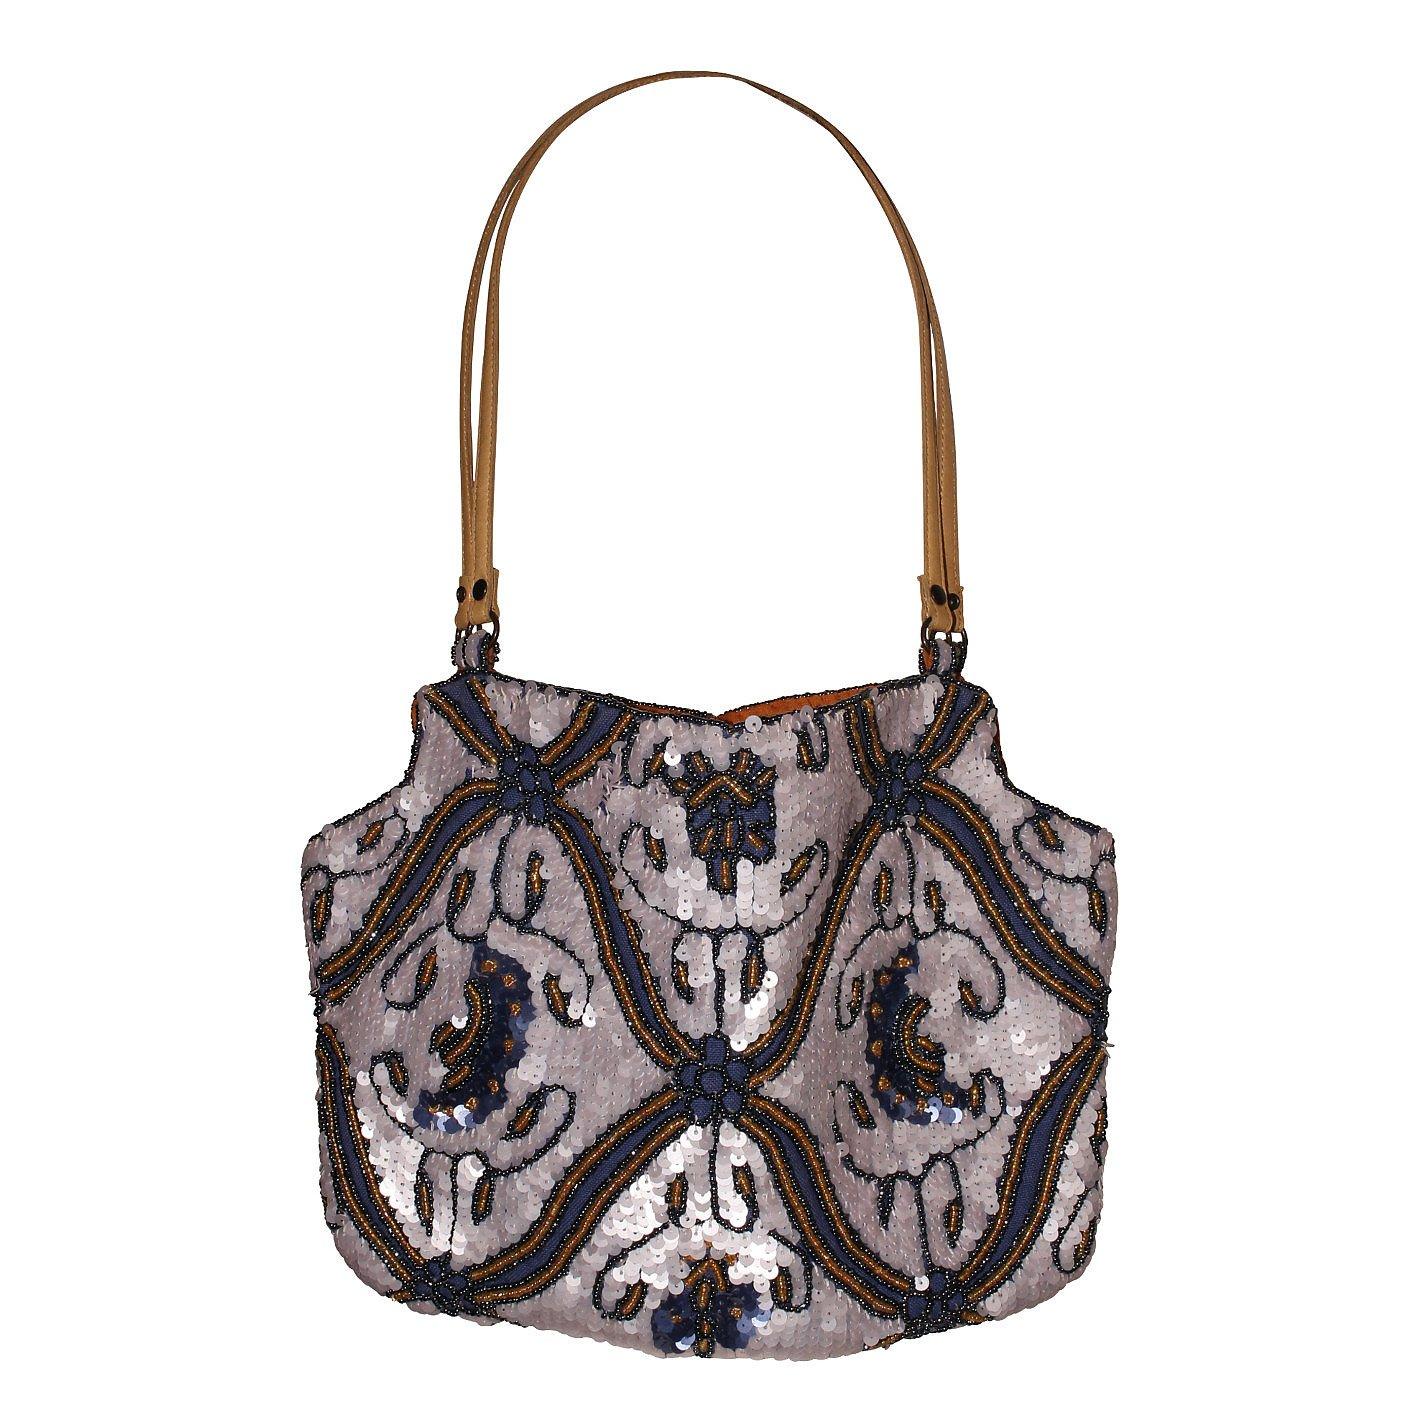 Jamin Puech Sequined Shoulder Bag